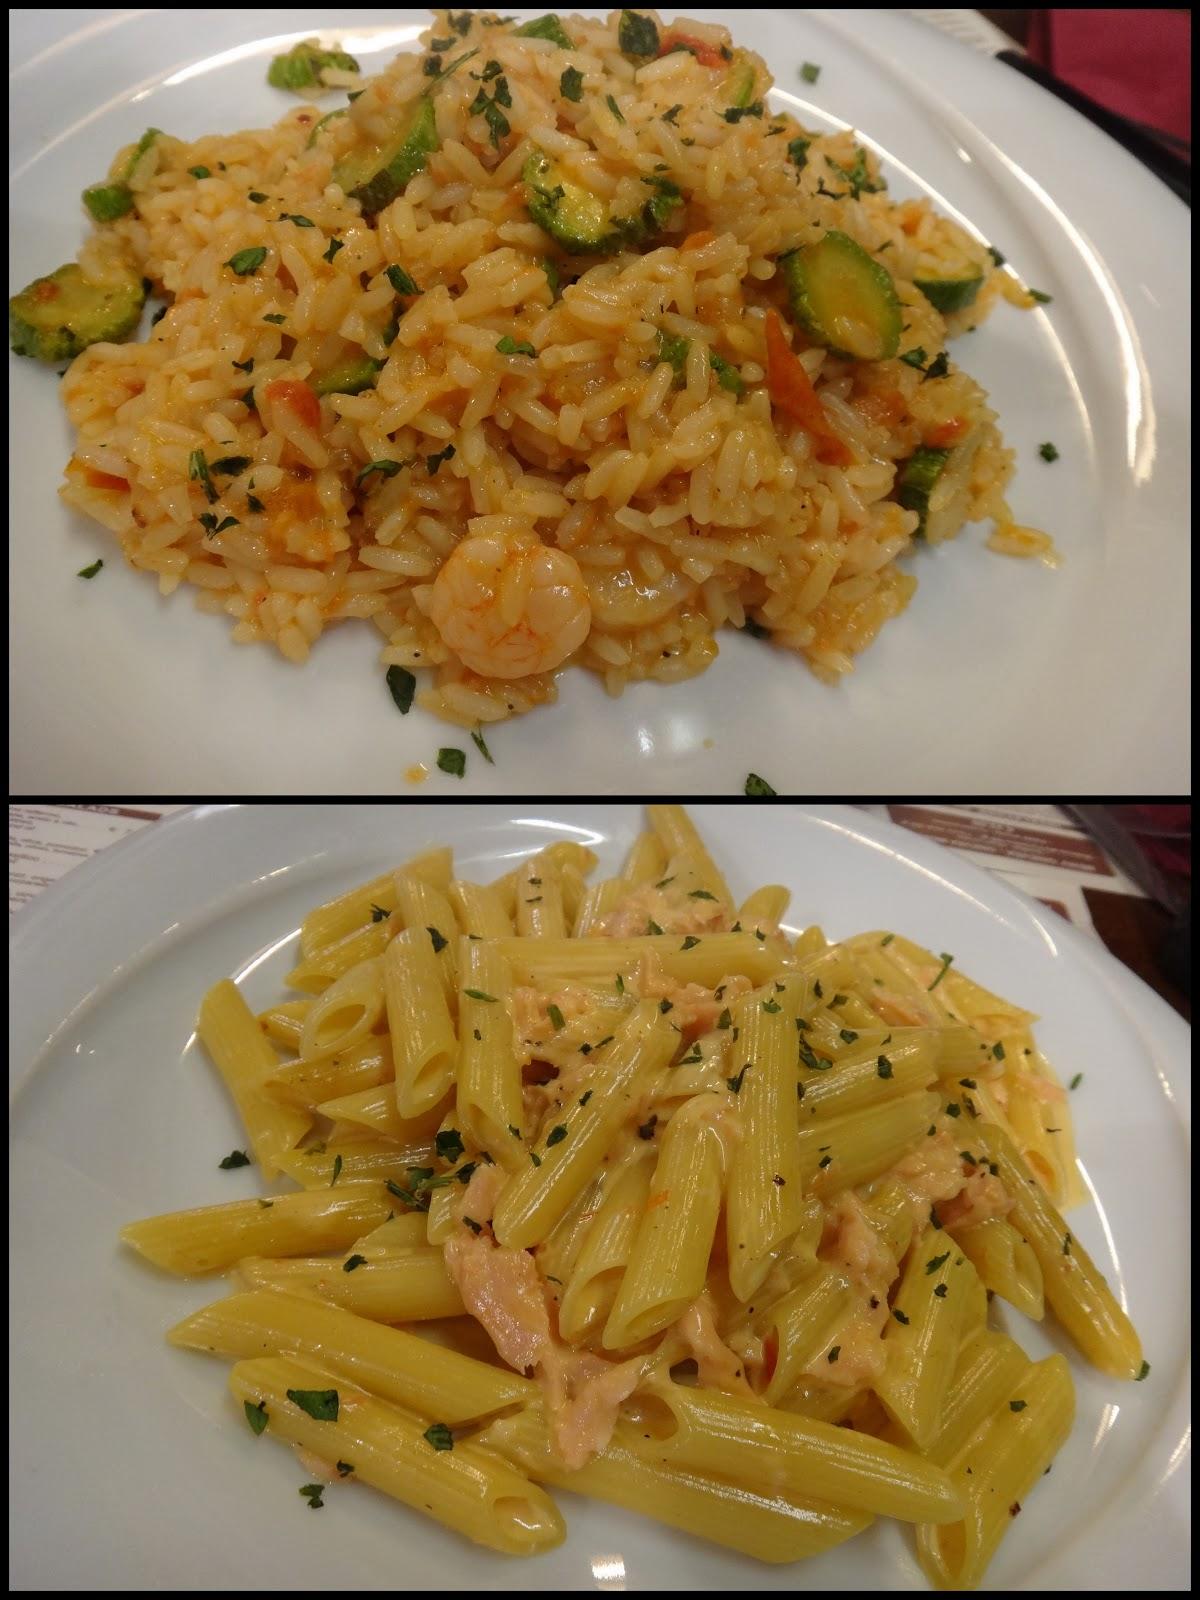 florence italian cuisine irvine - photo#28